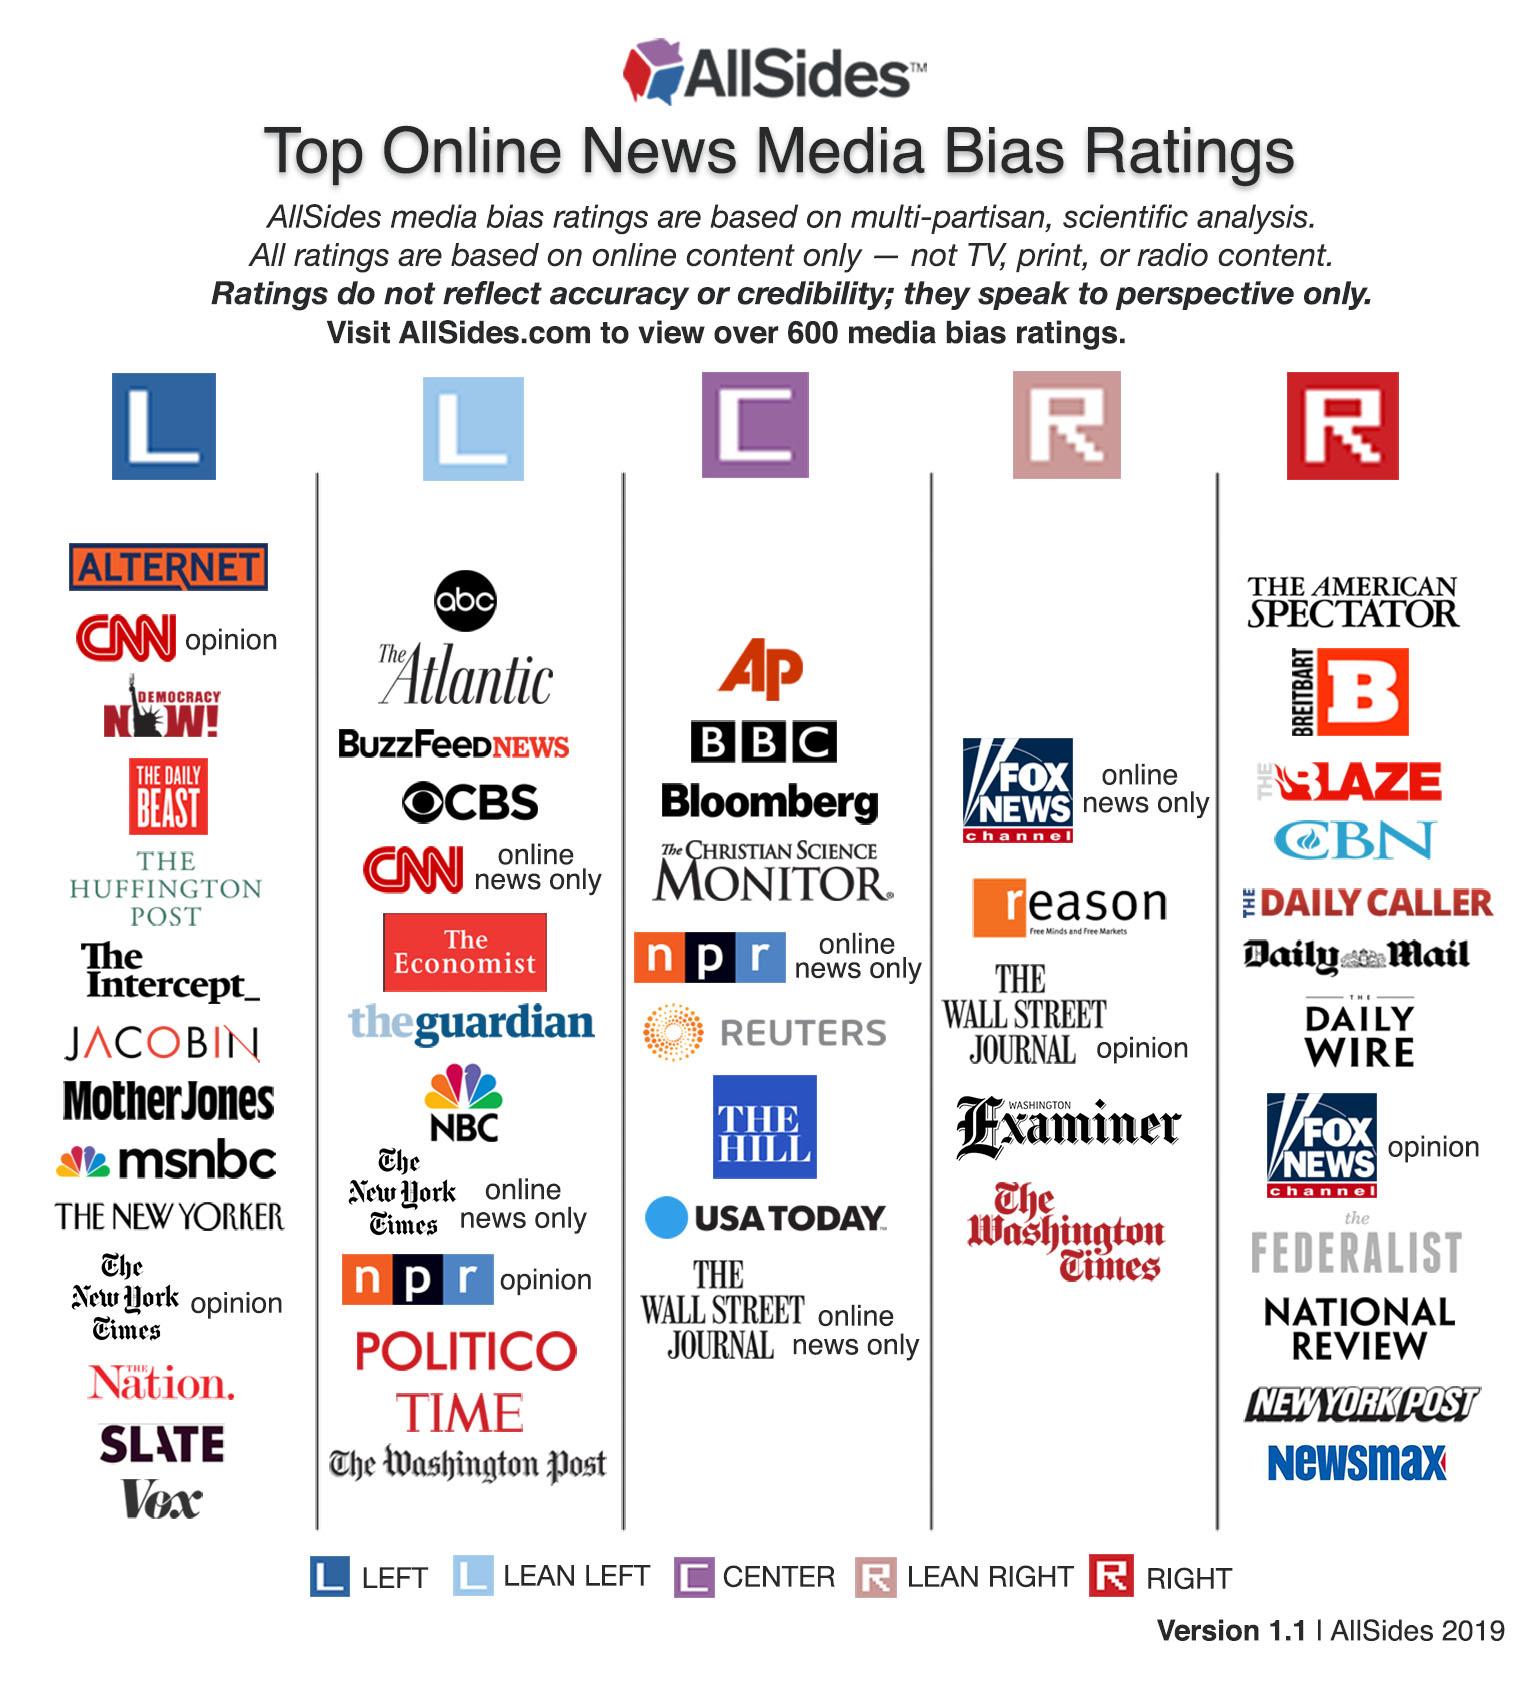 Top Online News Media Bias Ratings